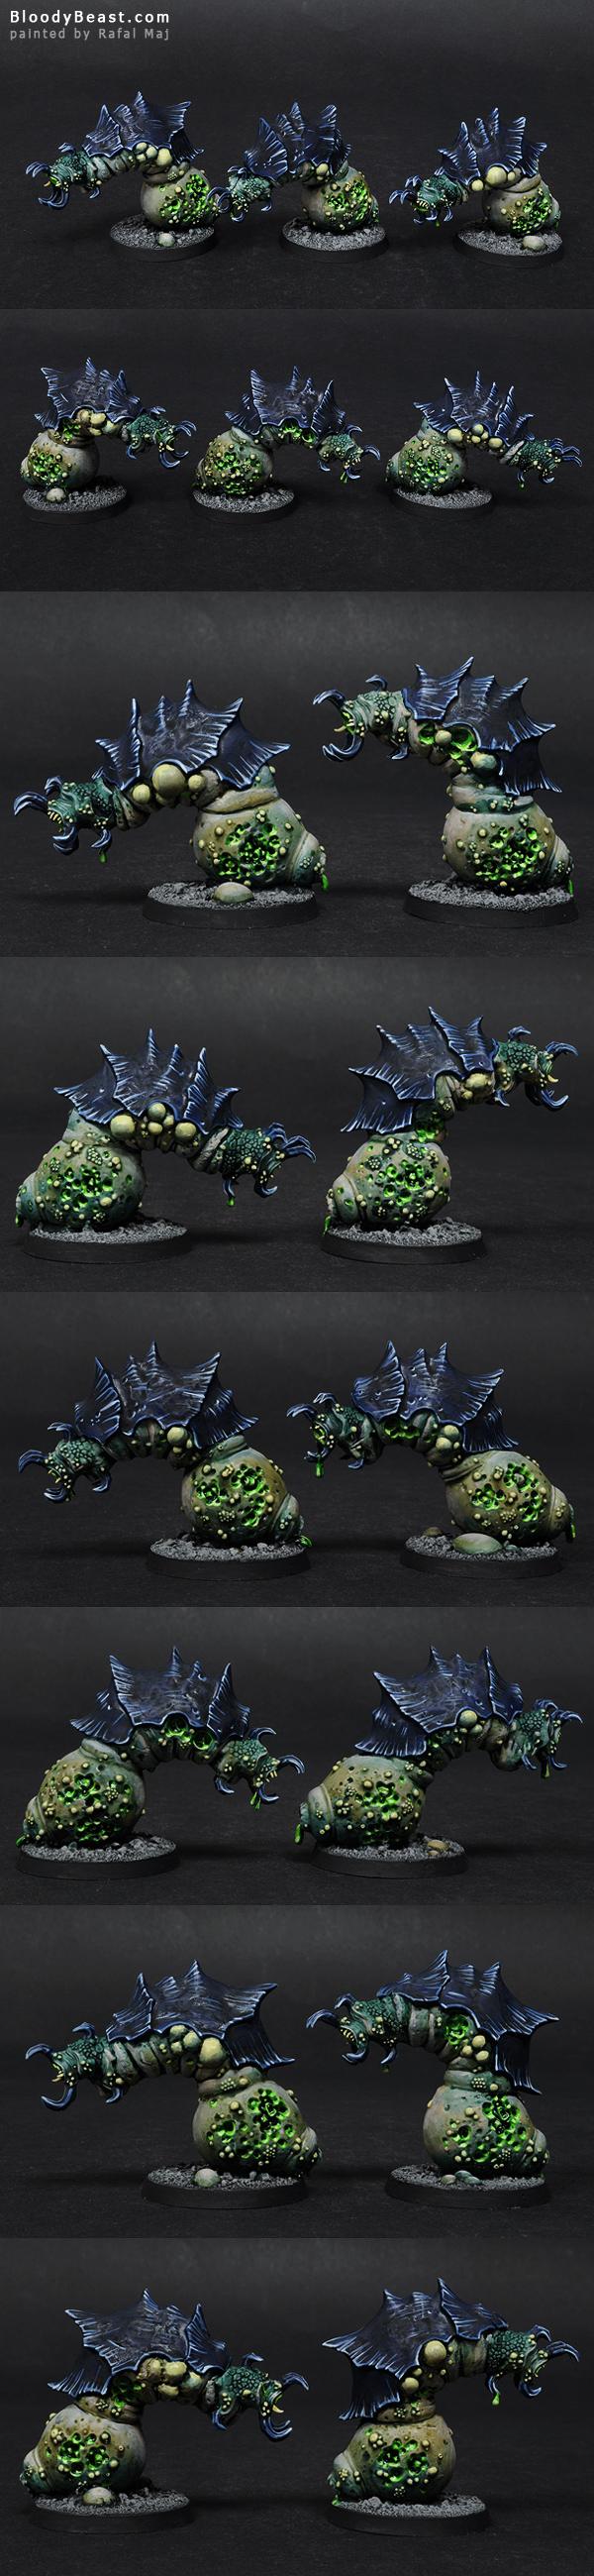 Beasts of Nurgle painted by Rafal Maj (BloodyBeast.com)